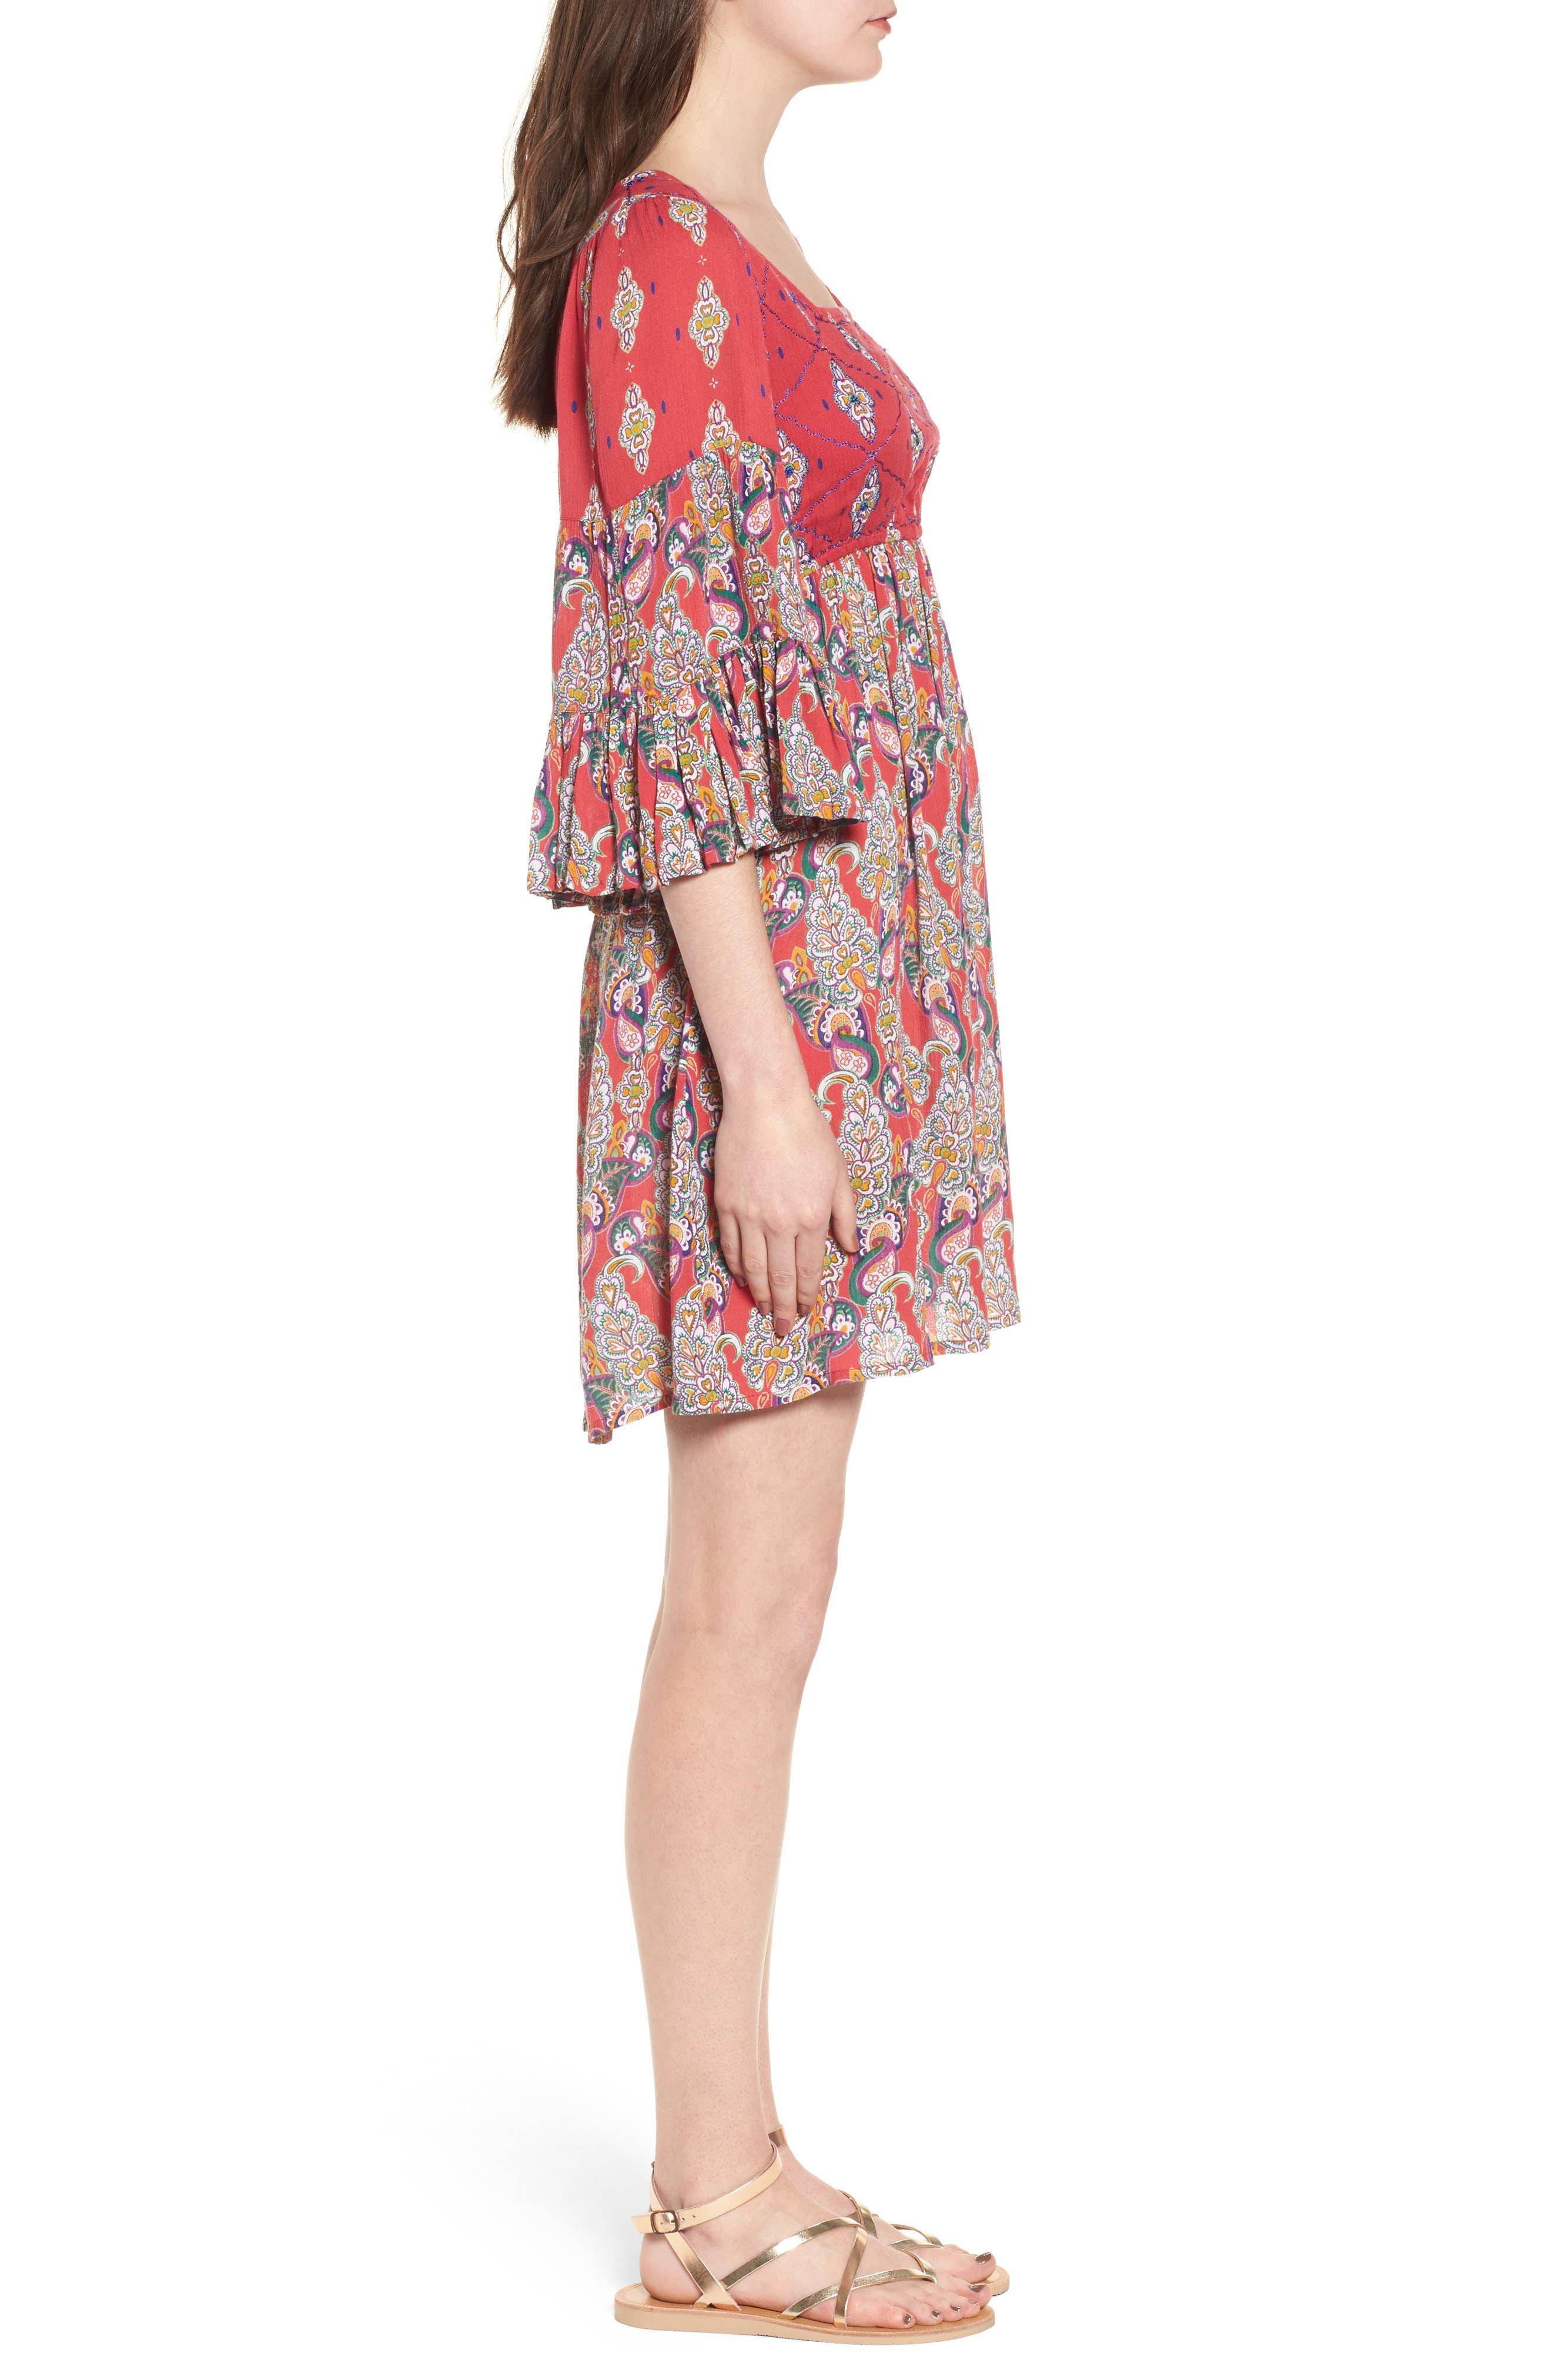 Alice Bell Sleeve Babydoll Dress,                             Alternate thumbnail 3, color,                             645